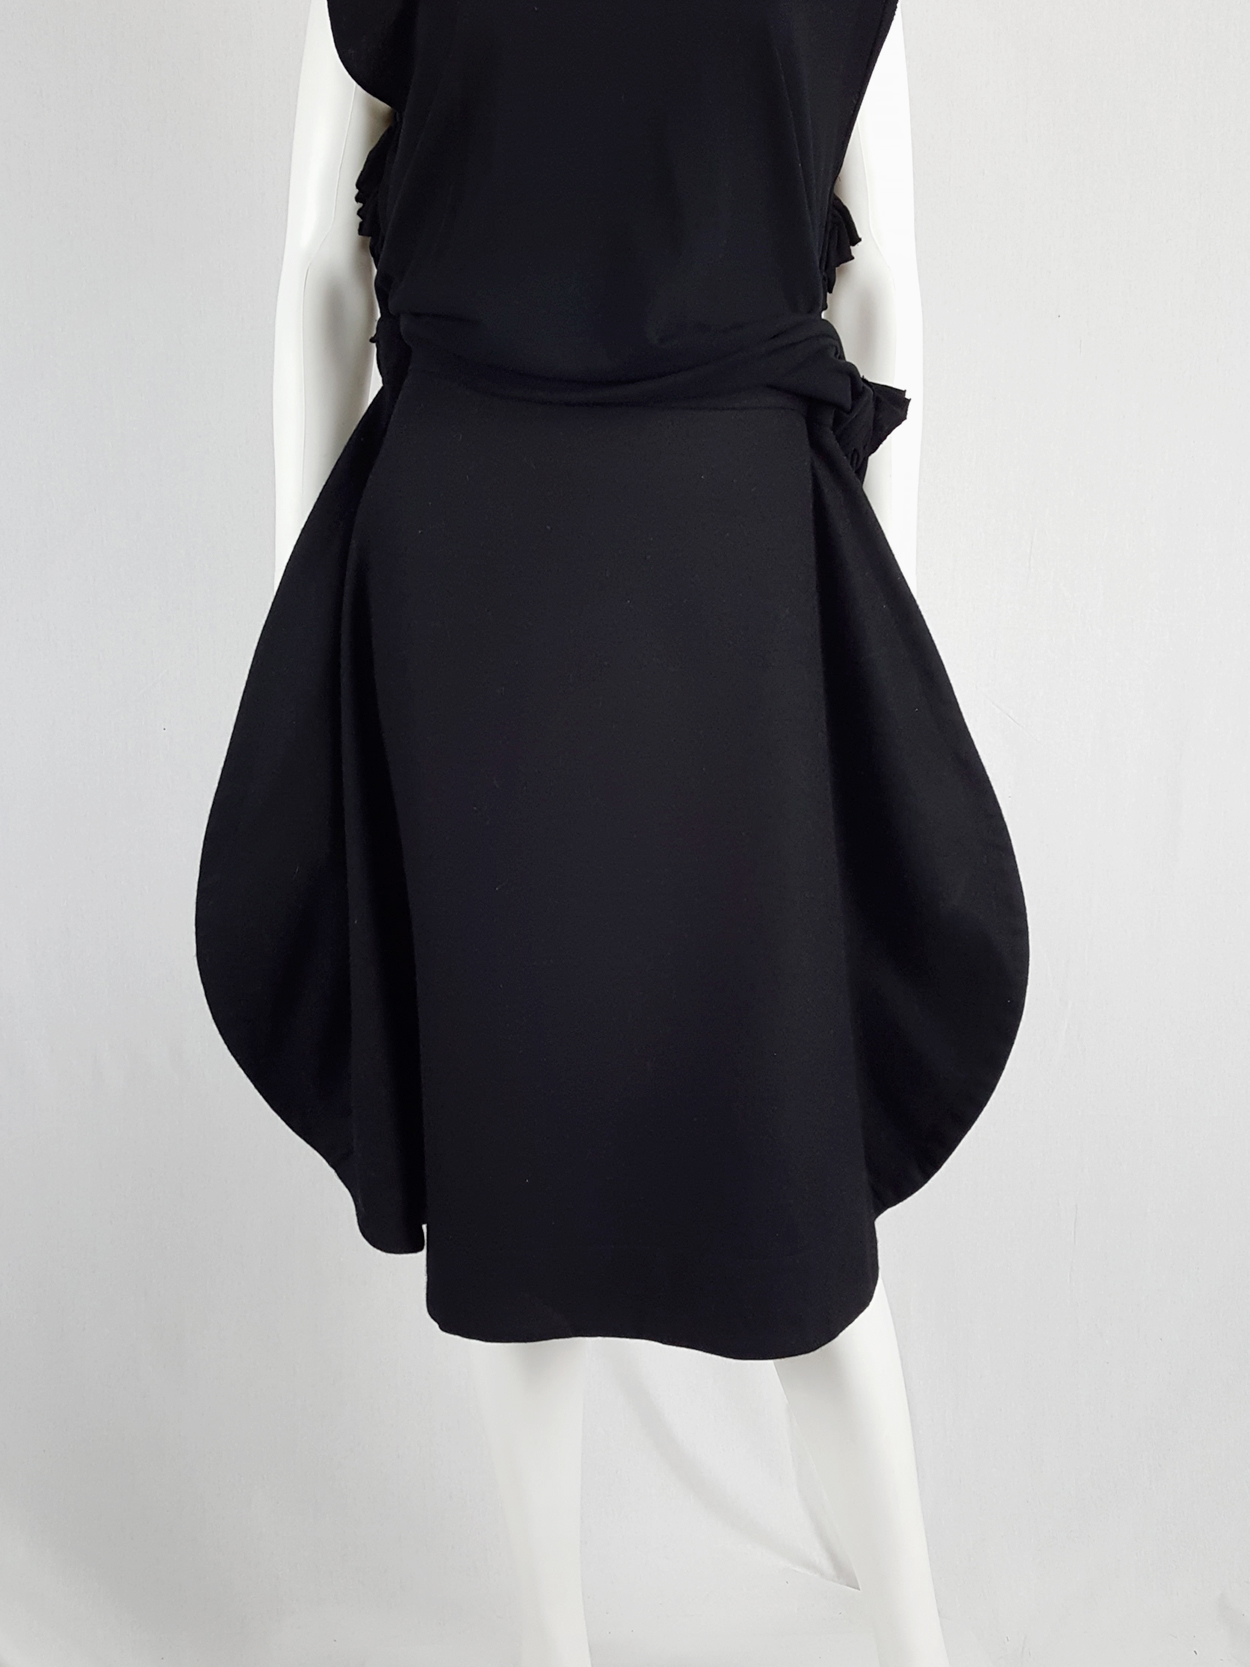 vintage Comme des Garcons black 2D circle skirt fall 2012 130610